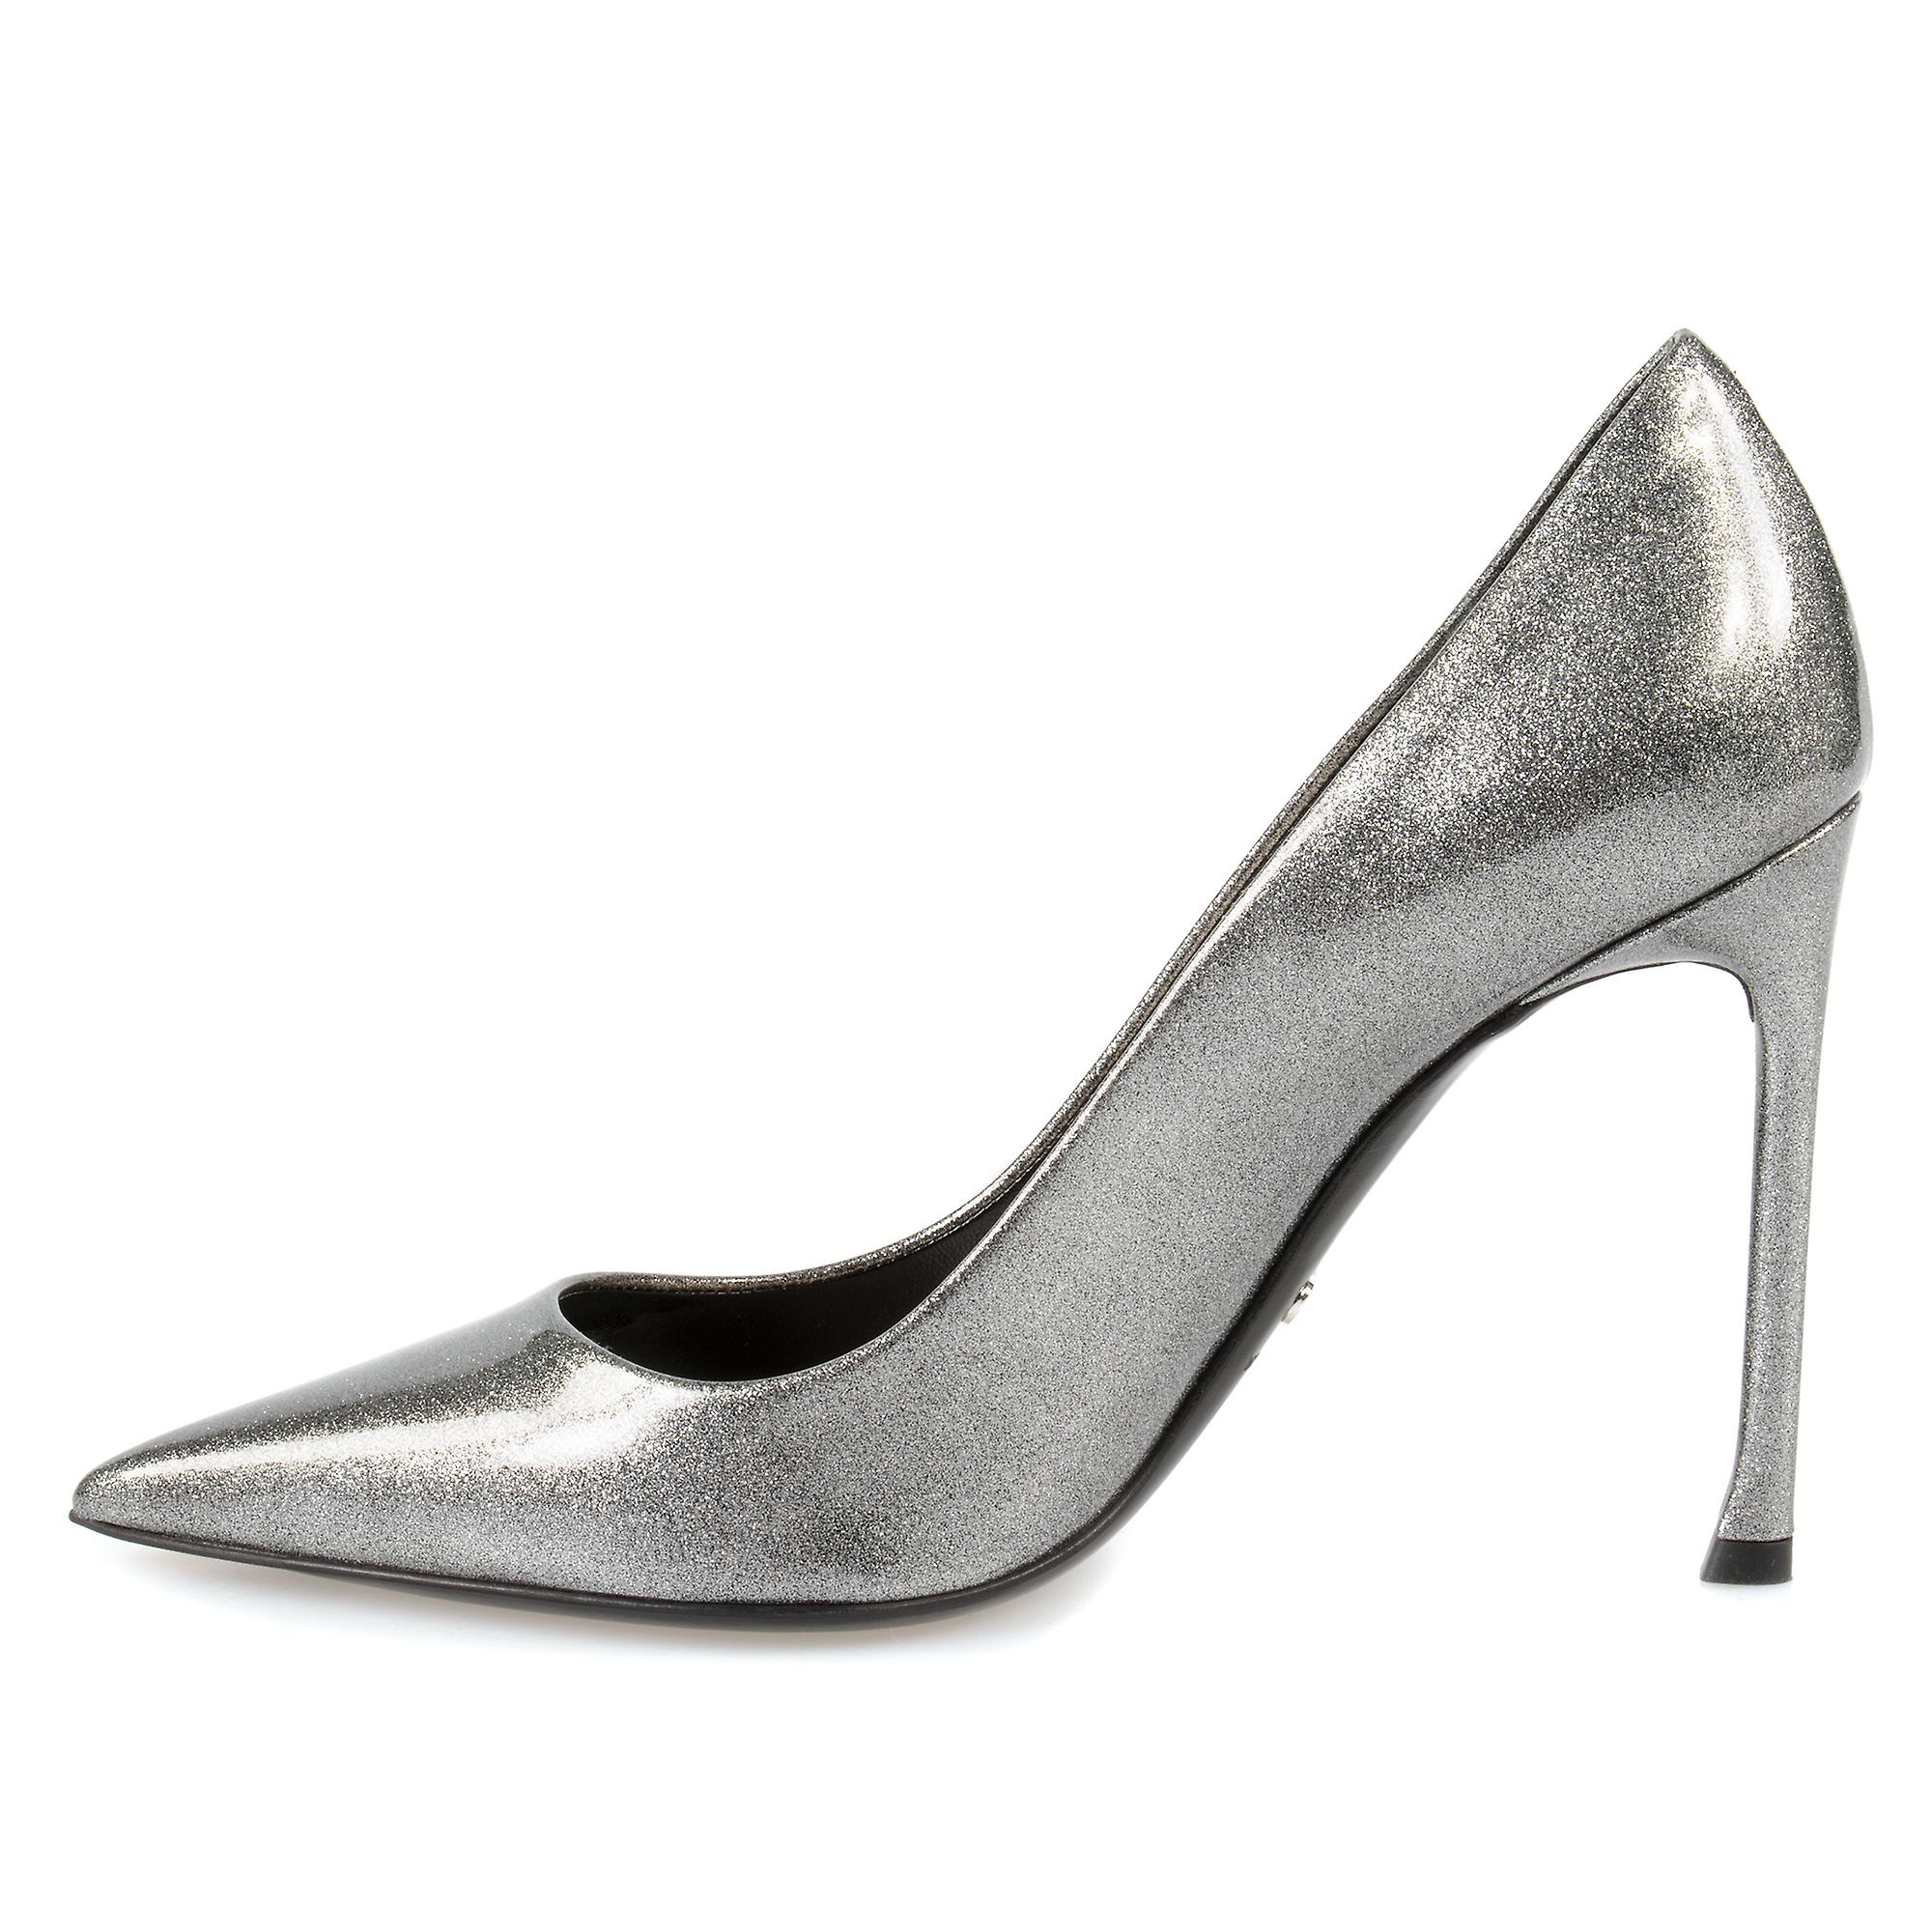 Dior Patent Calfskin Pump | Grey | 10cm